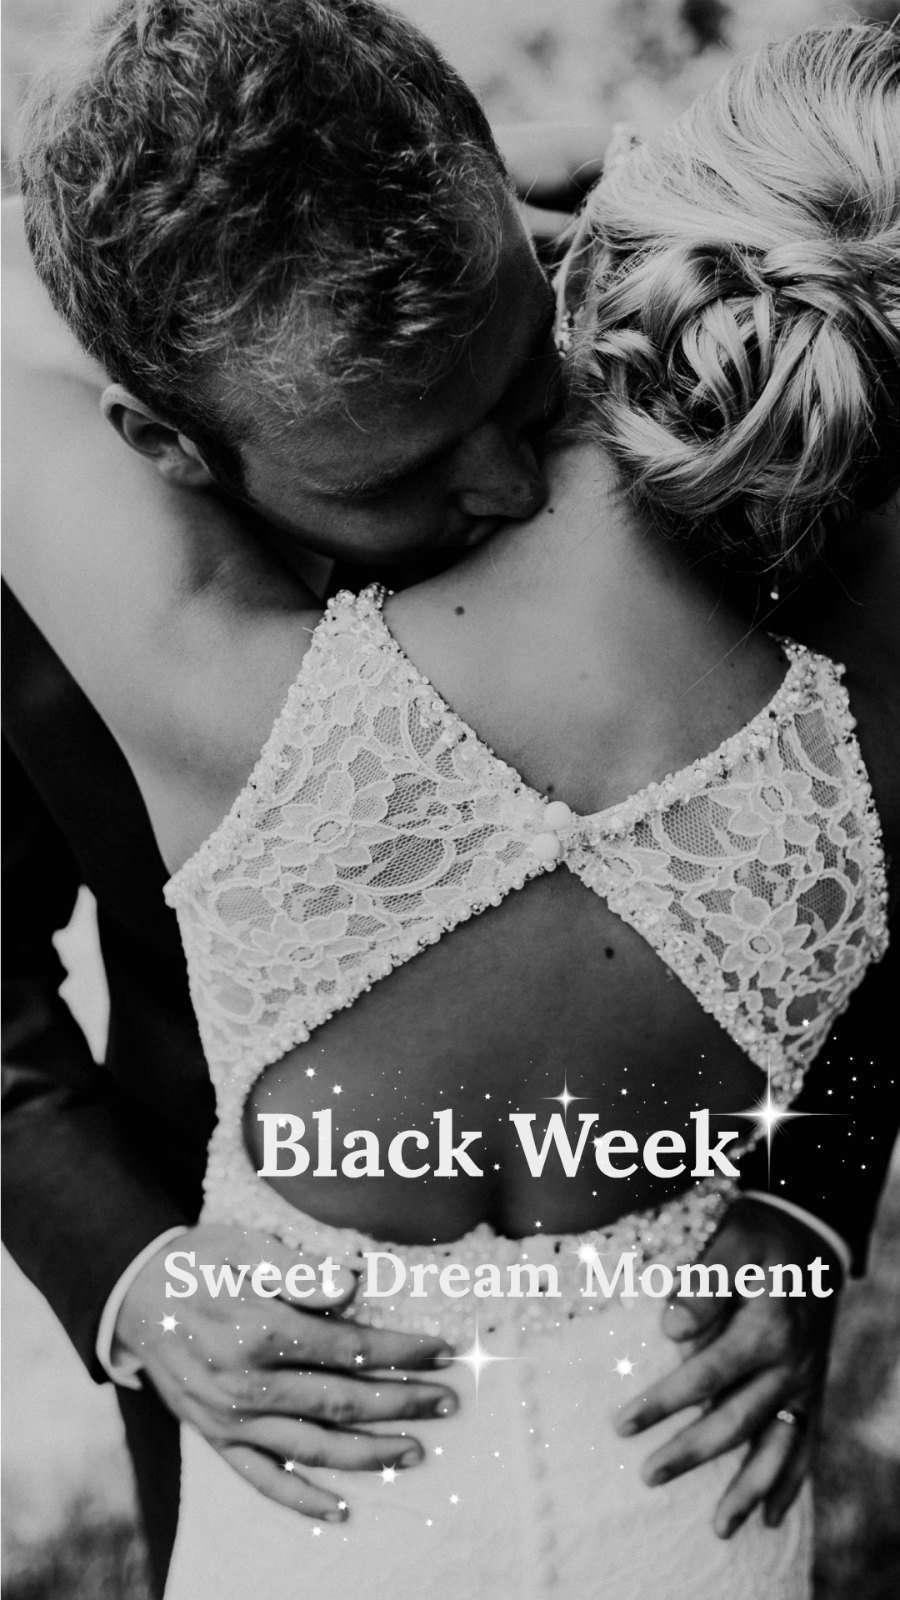 Black week en sweet Dream Moment